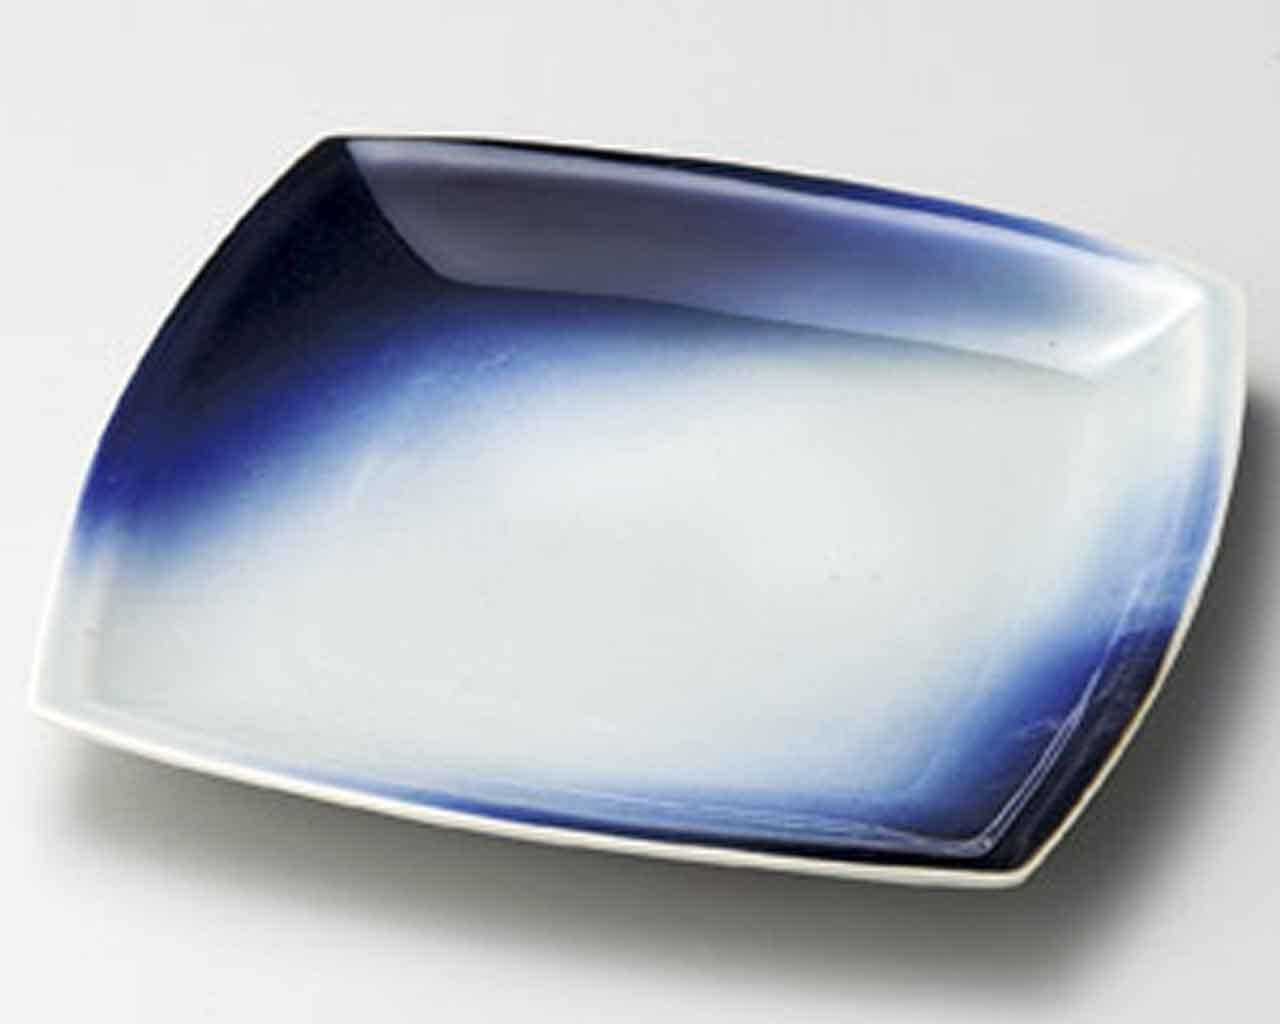 Aozora Blue Sky 8.8inch Set of 2 Medium Plates White Ceramic Made in Japan